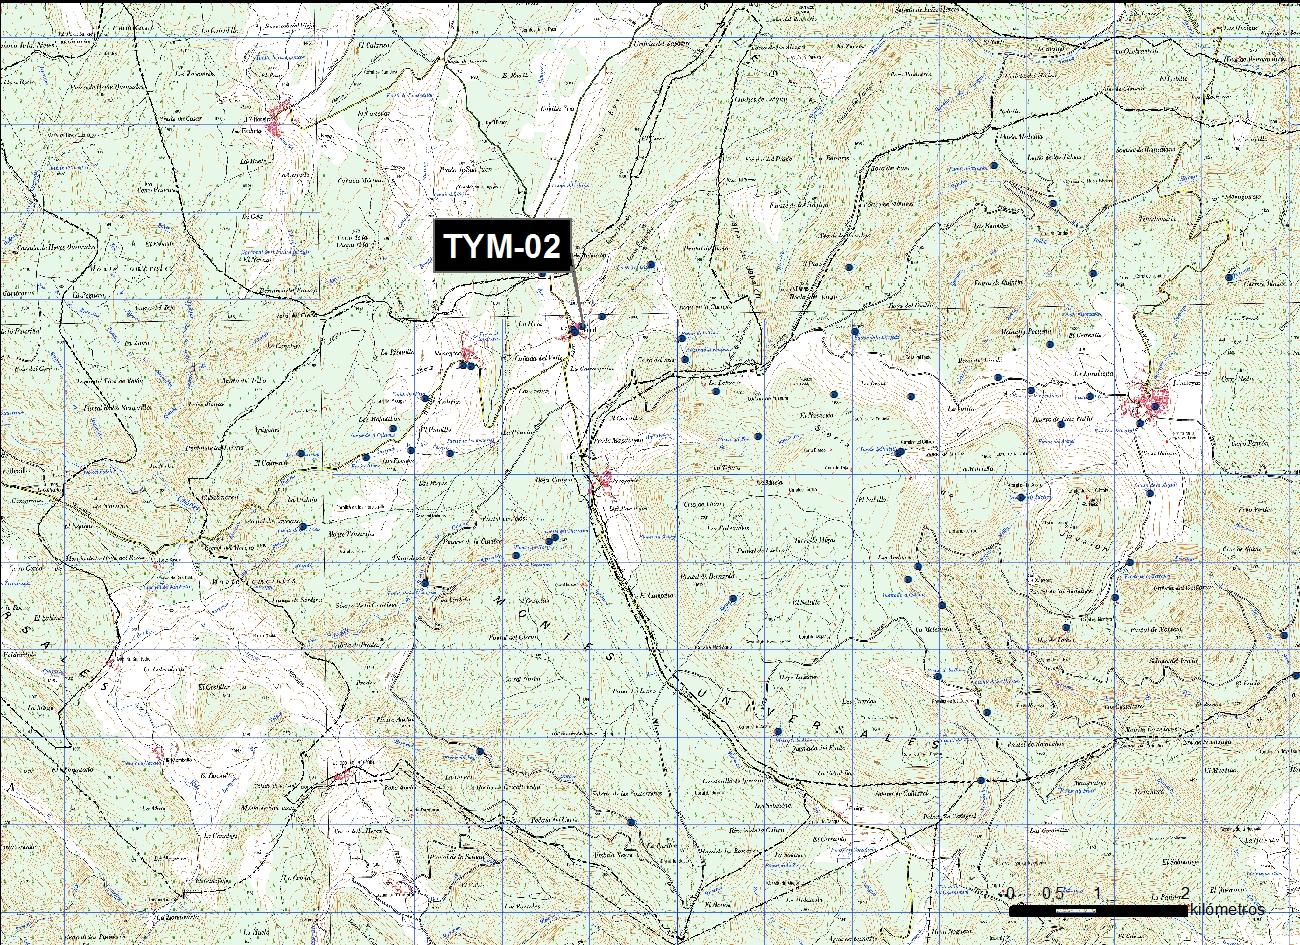 TYM_02_M.V.LOZANO_PRADO_MAP.TOPO 1